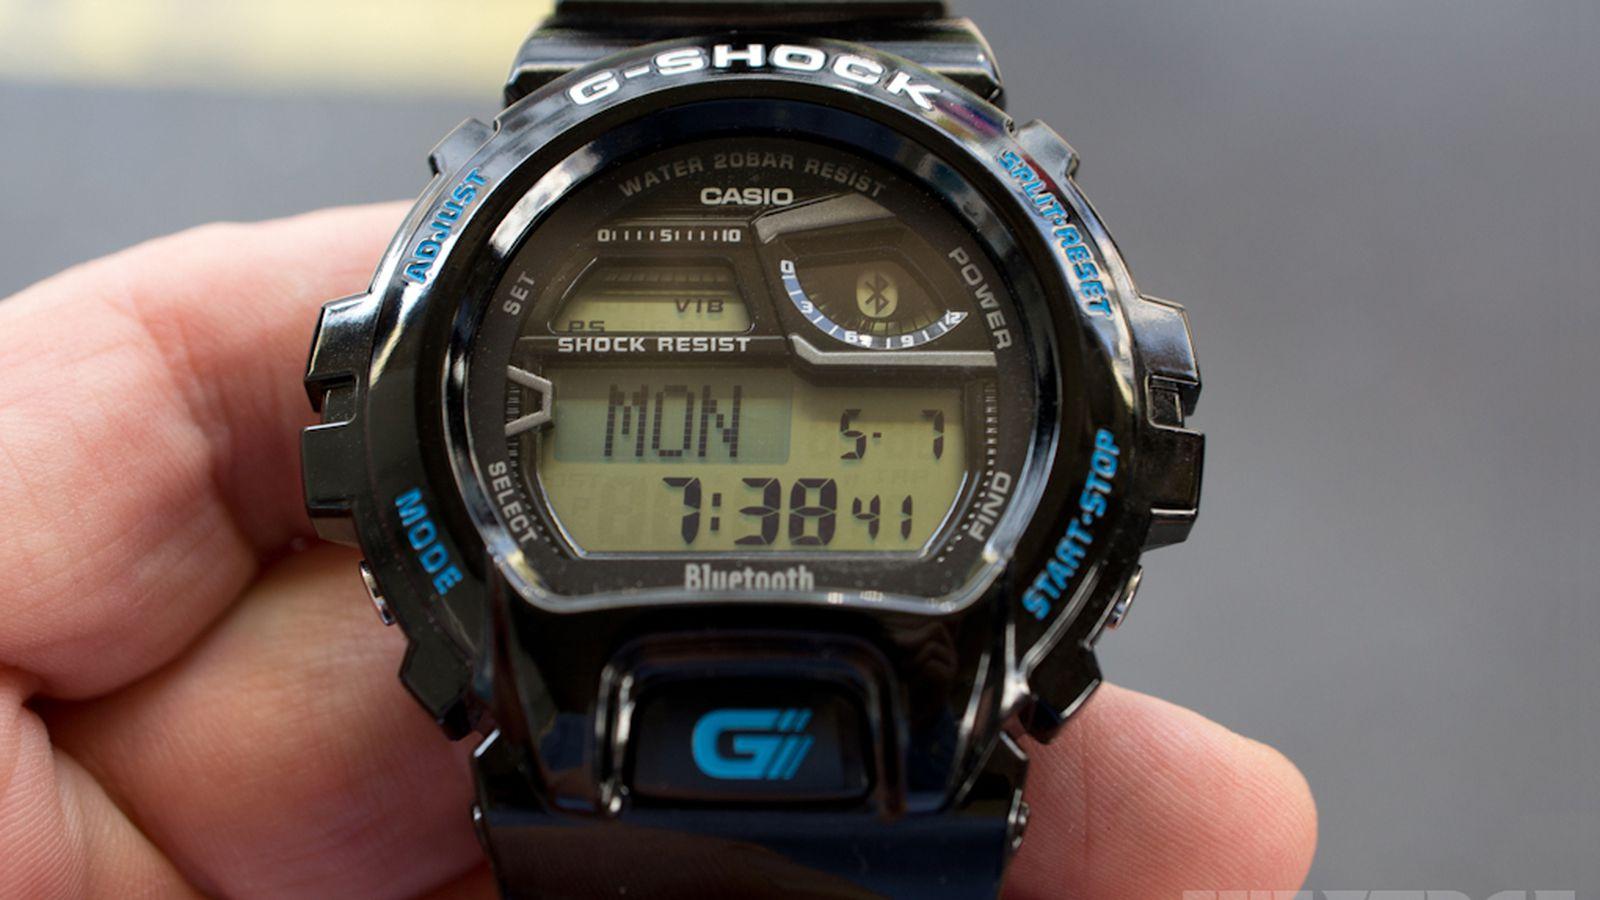 Casio G-Shock GB-6900 Bluetooth watch review